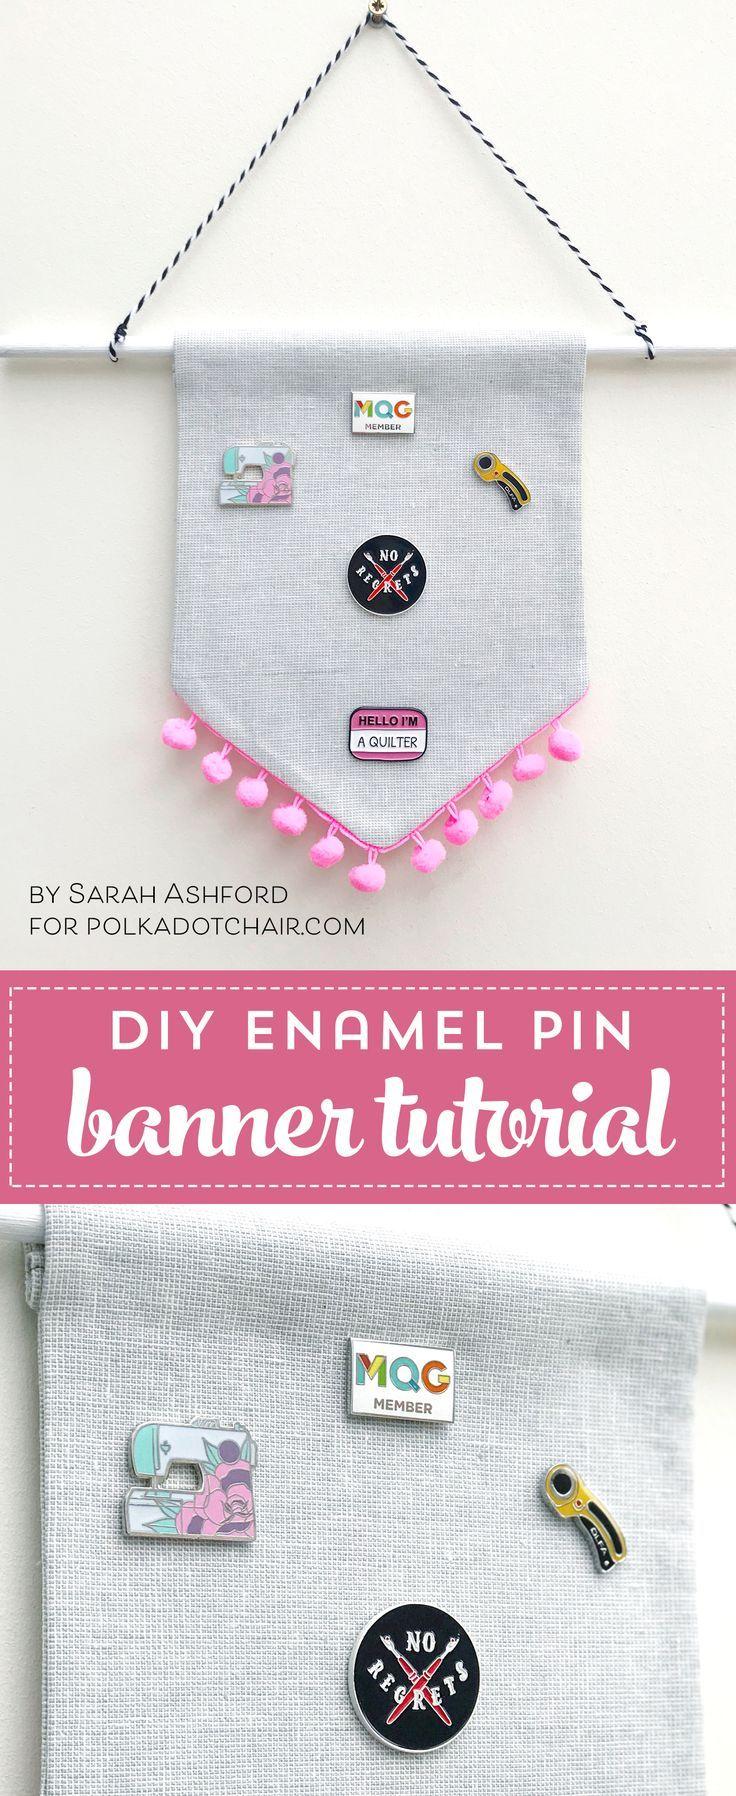 DIY Crafts : A great enamel pin display idea! Create a